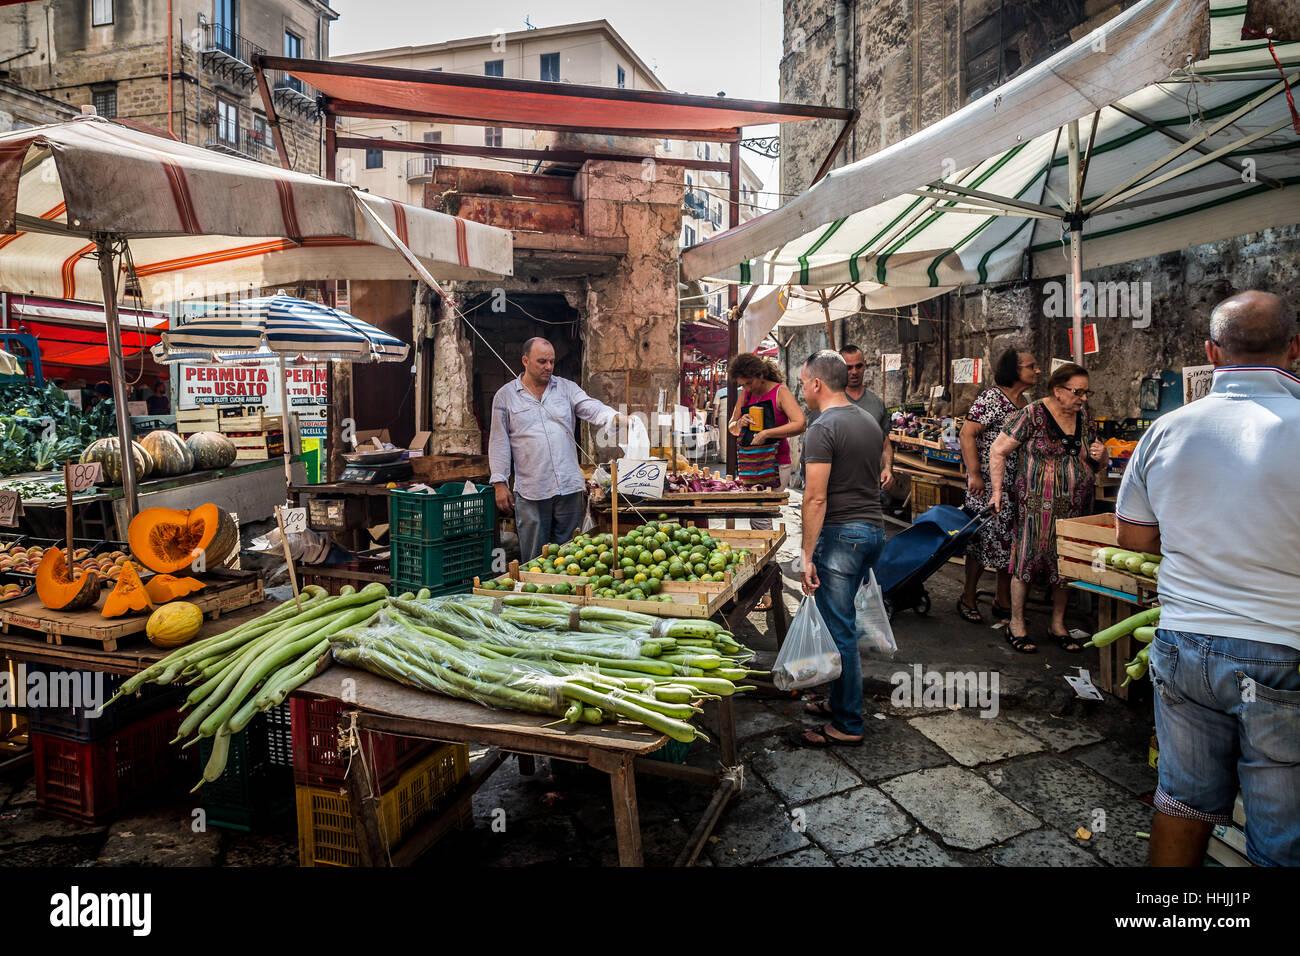 Kiosque de légumes dans le marché Ballaro, Palermo, Sicily Photo Stock